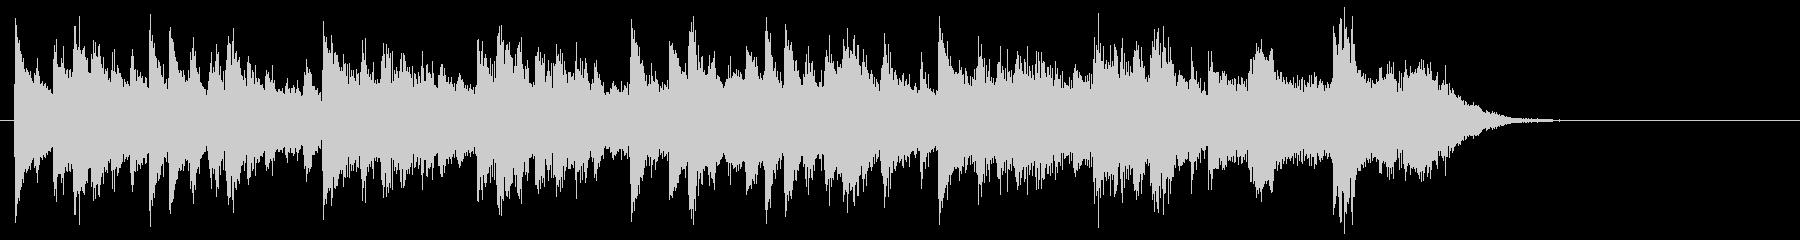 Light and calm piano jingle's unreproduced waveform